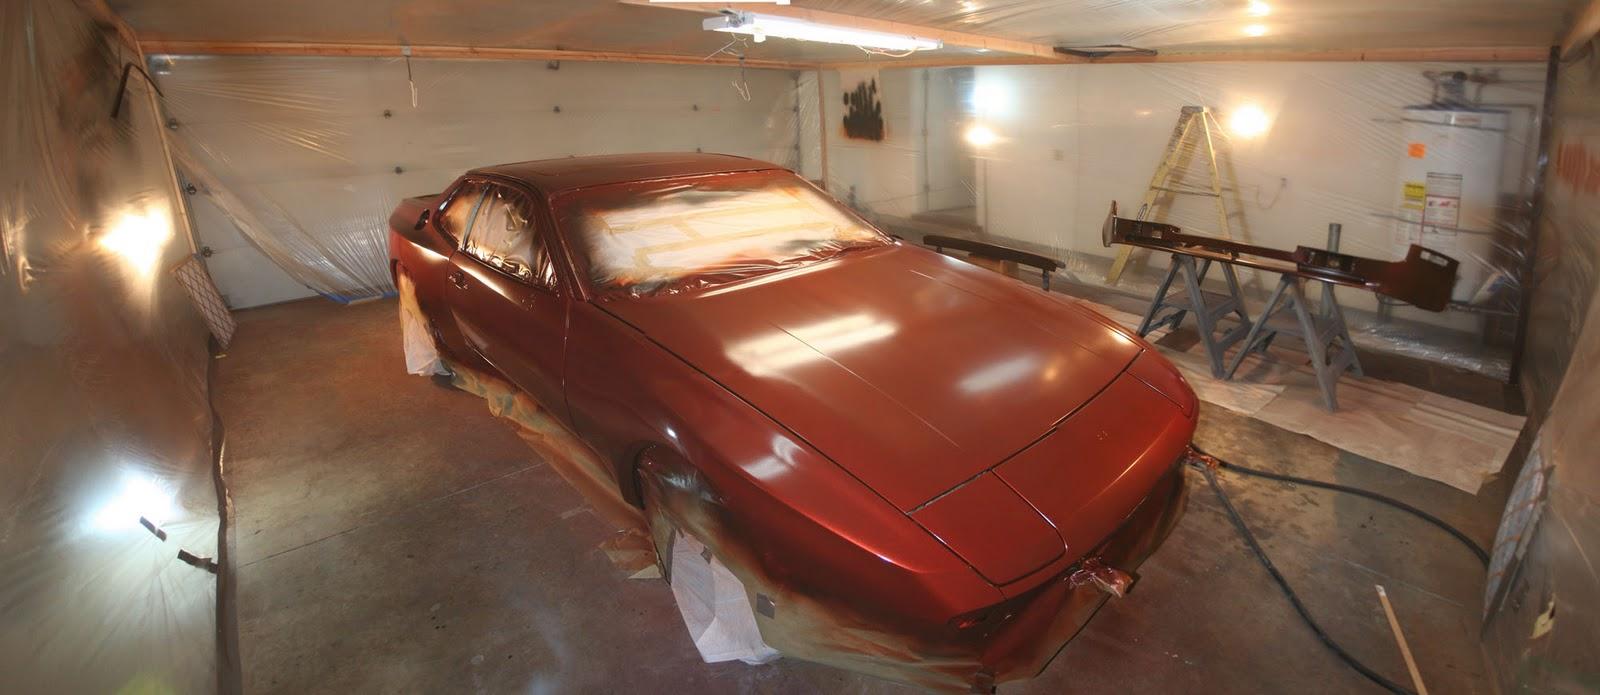 Cost For Painting Car Hood Defendbigbird Com